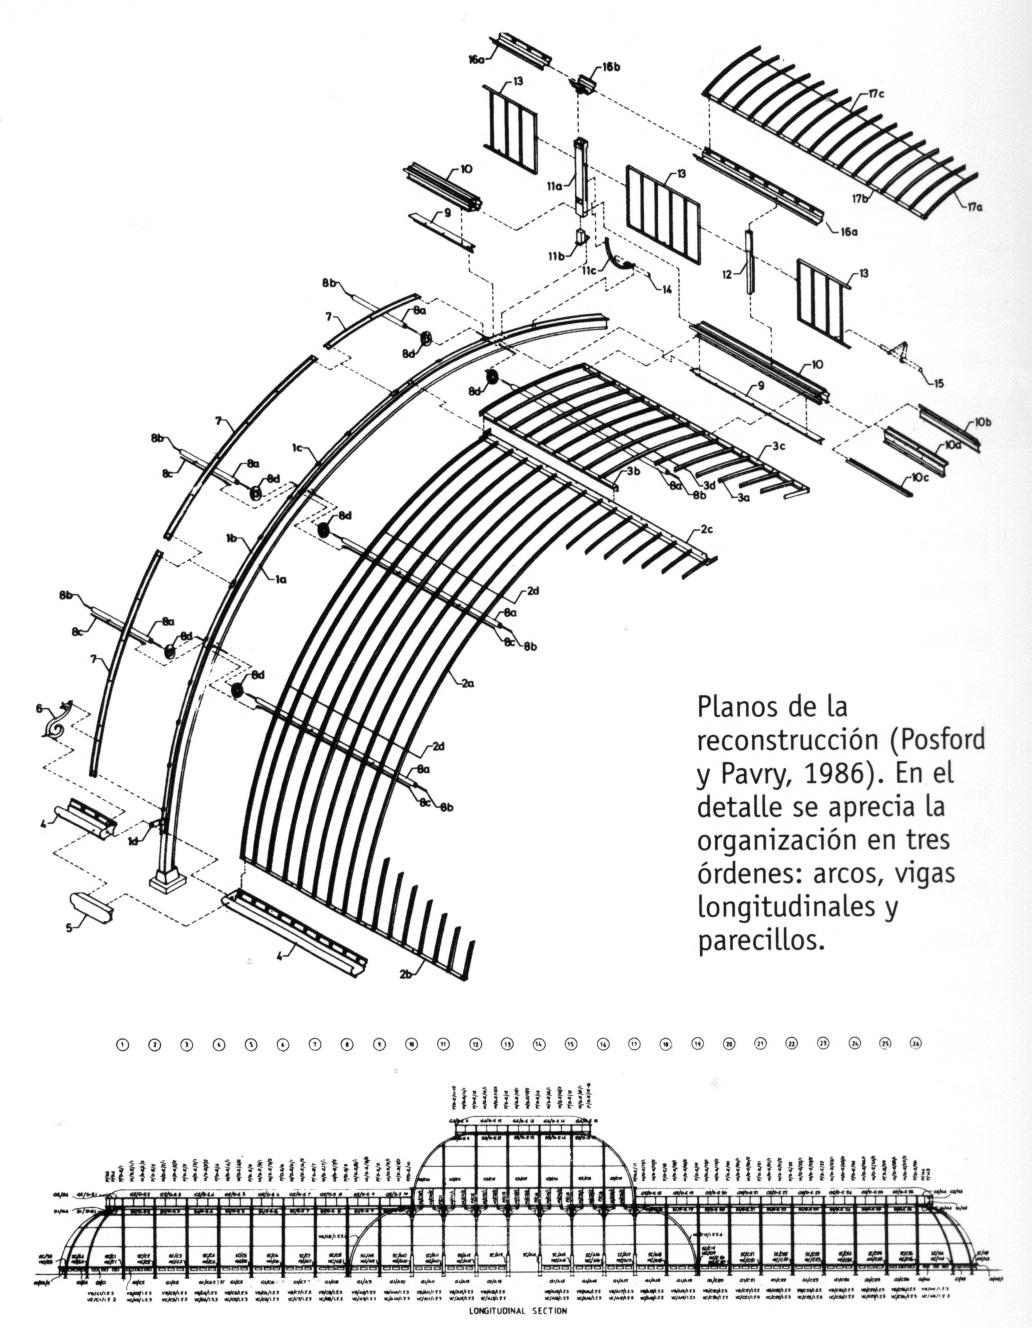 DETALLE-AXO Palm Garden House Plan on conservatory plans, tree plans, greenhouse plans, cathedral plans, pagoda plans, park plans, garden plans, pond plans, pavilion plans, wardian case plans,